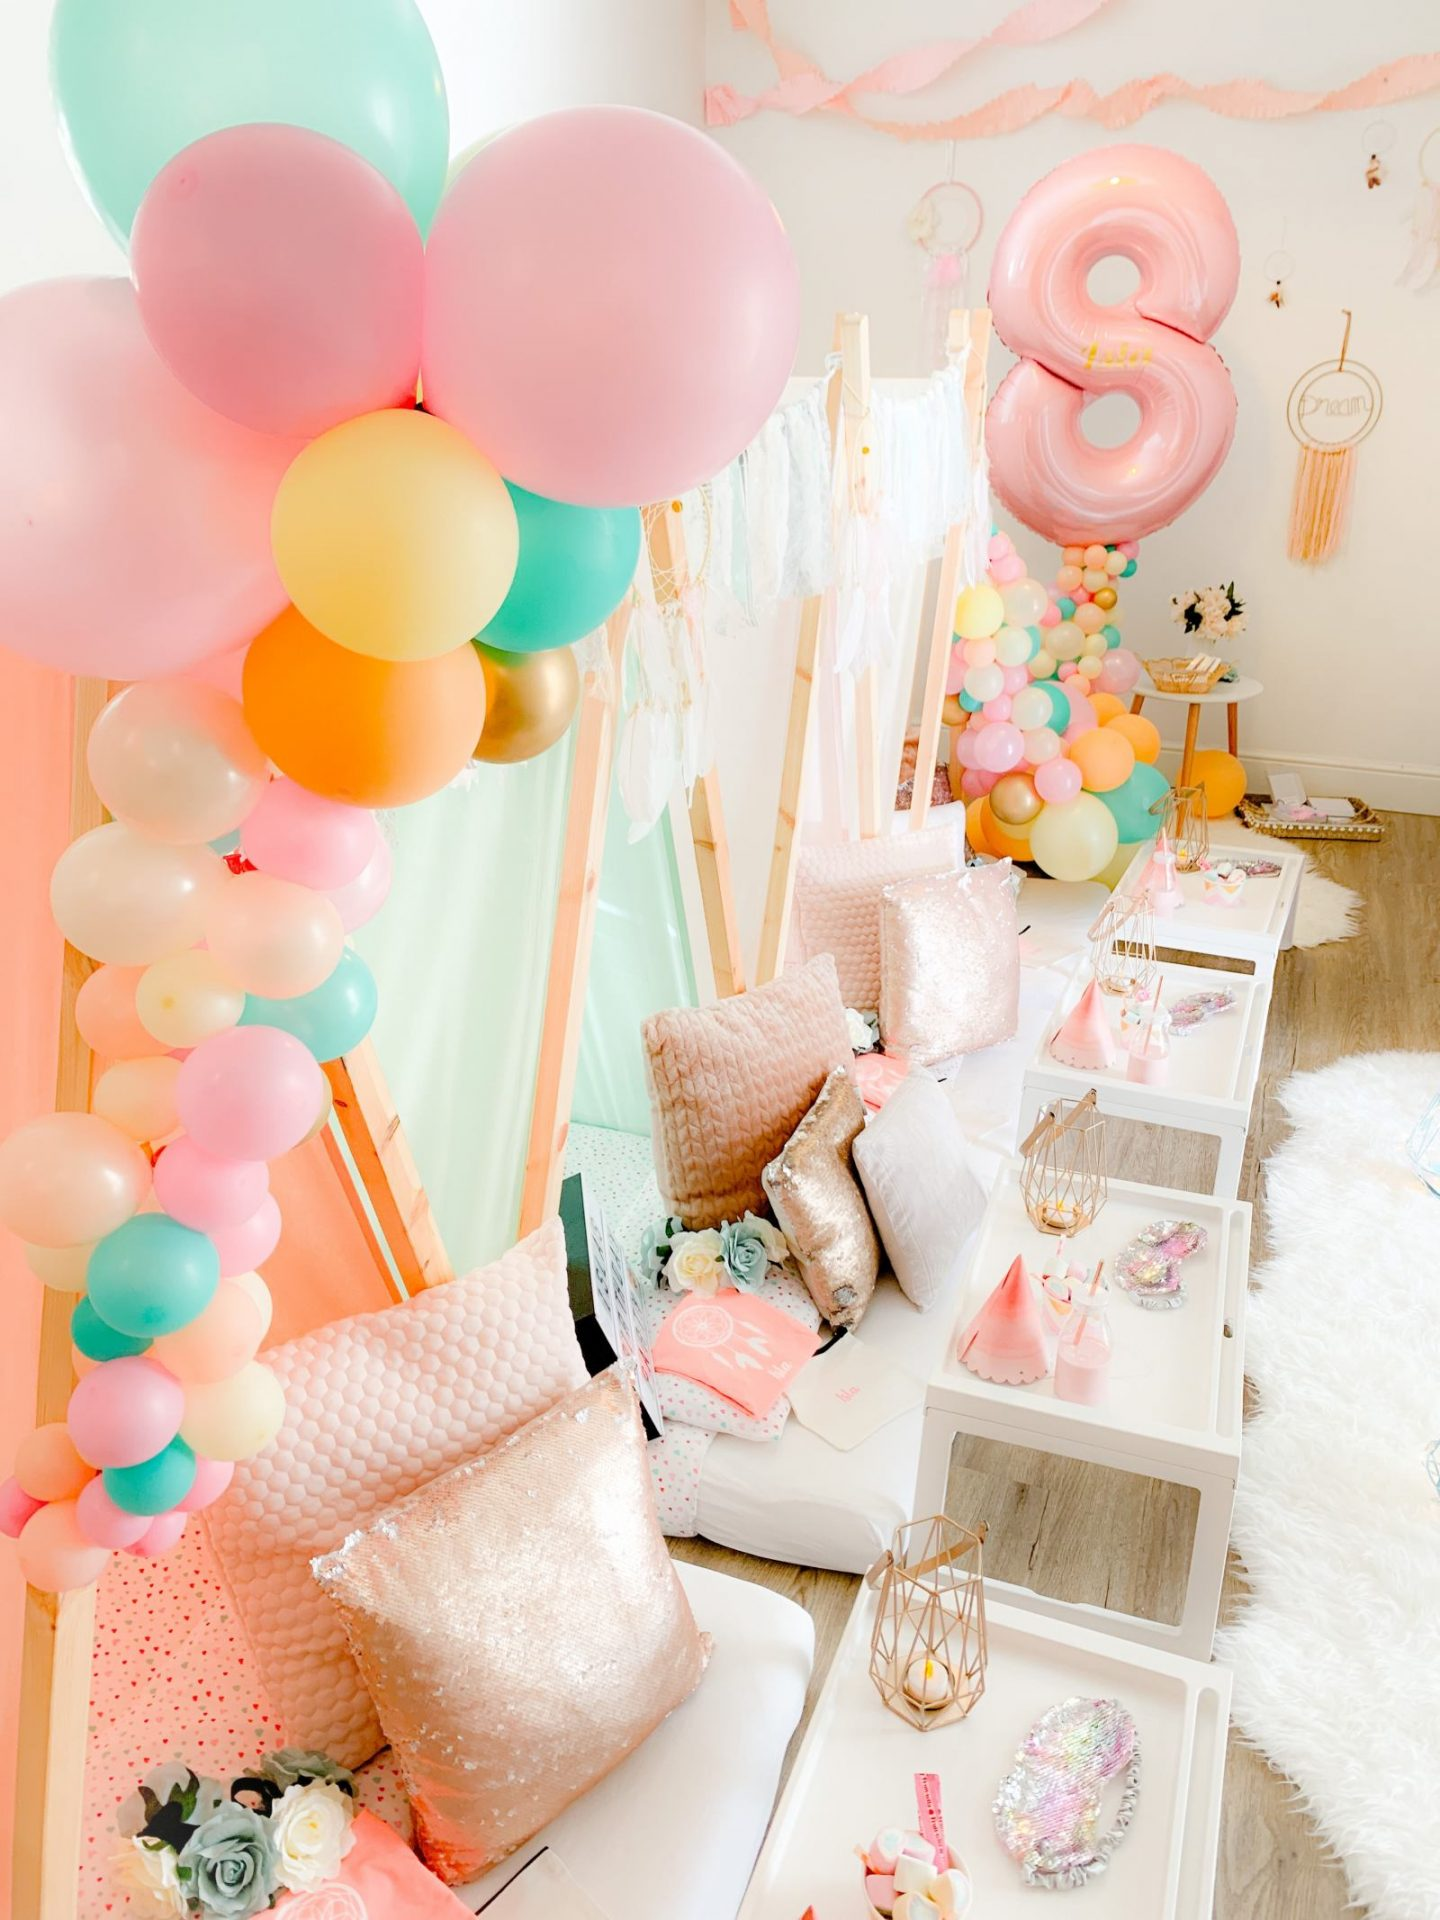 Boho Dreamcatcher Teepee Party